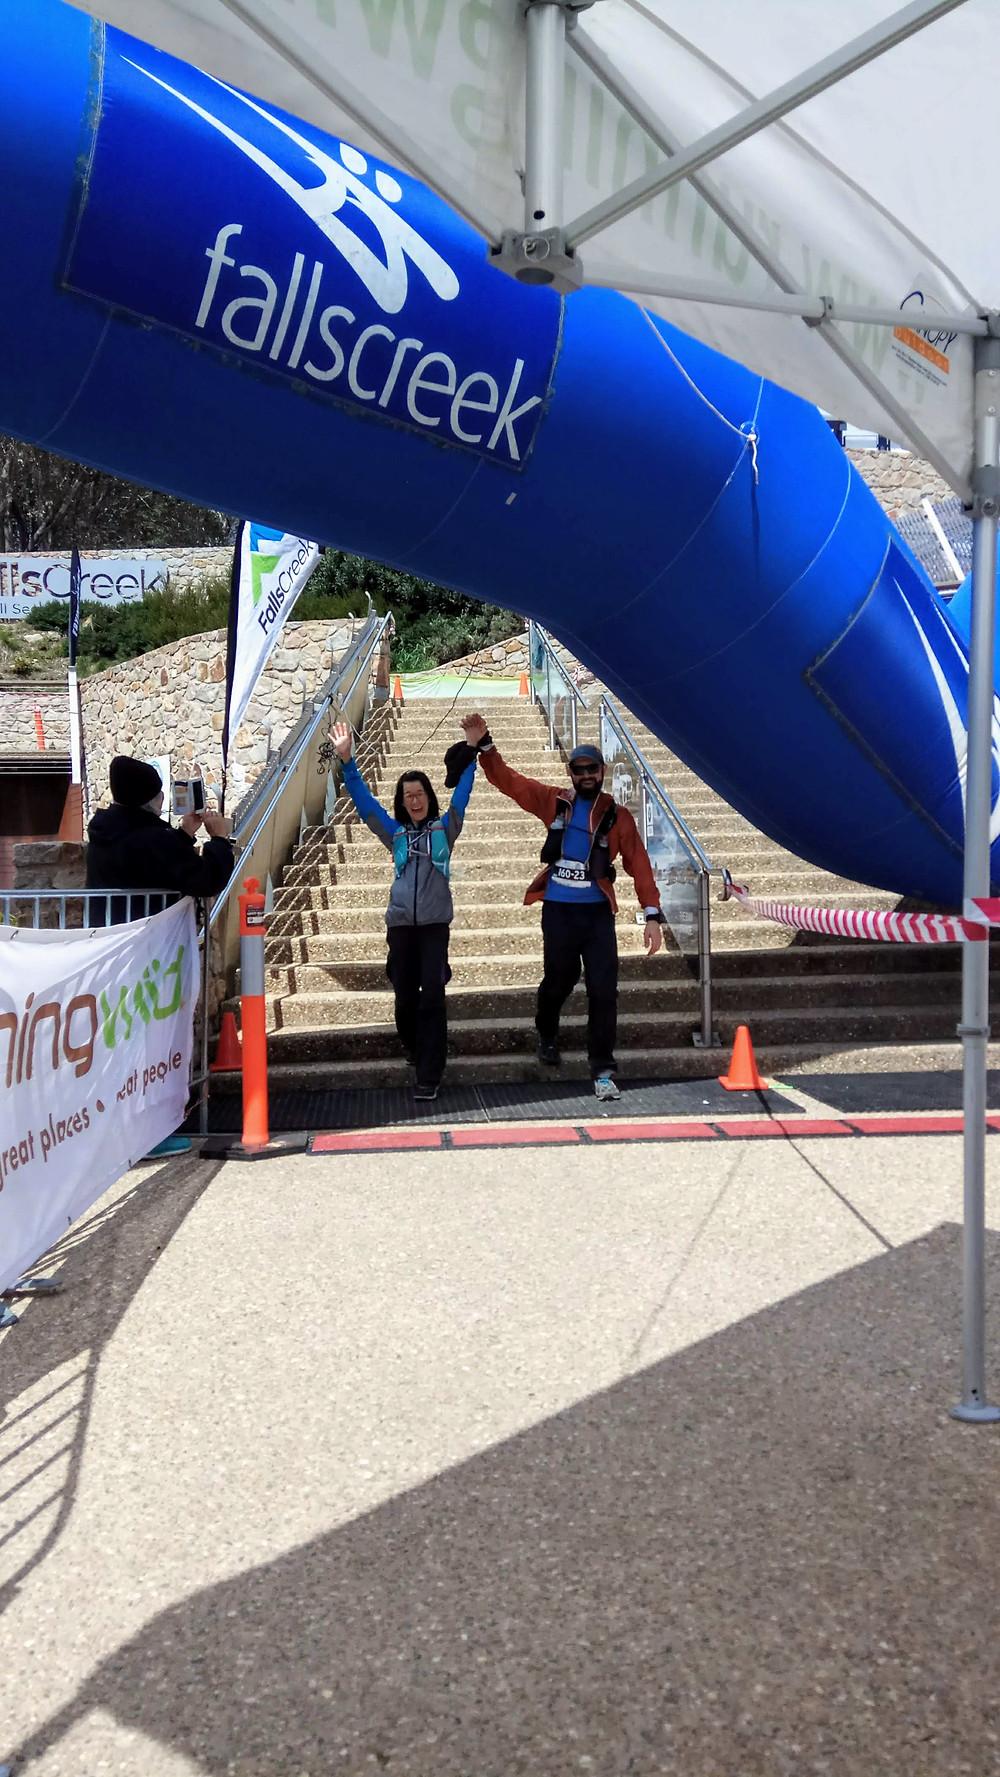 Alpine Challenge 100 miler finish